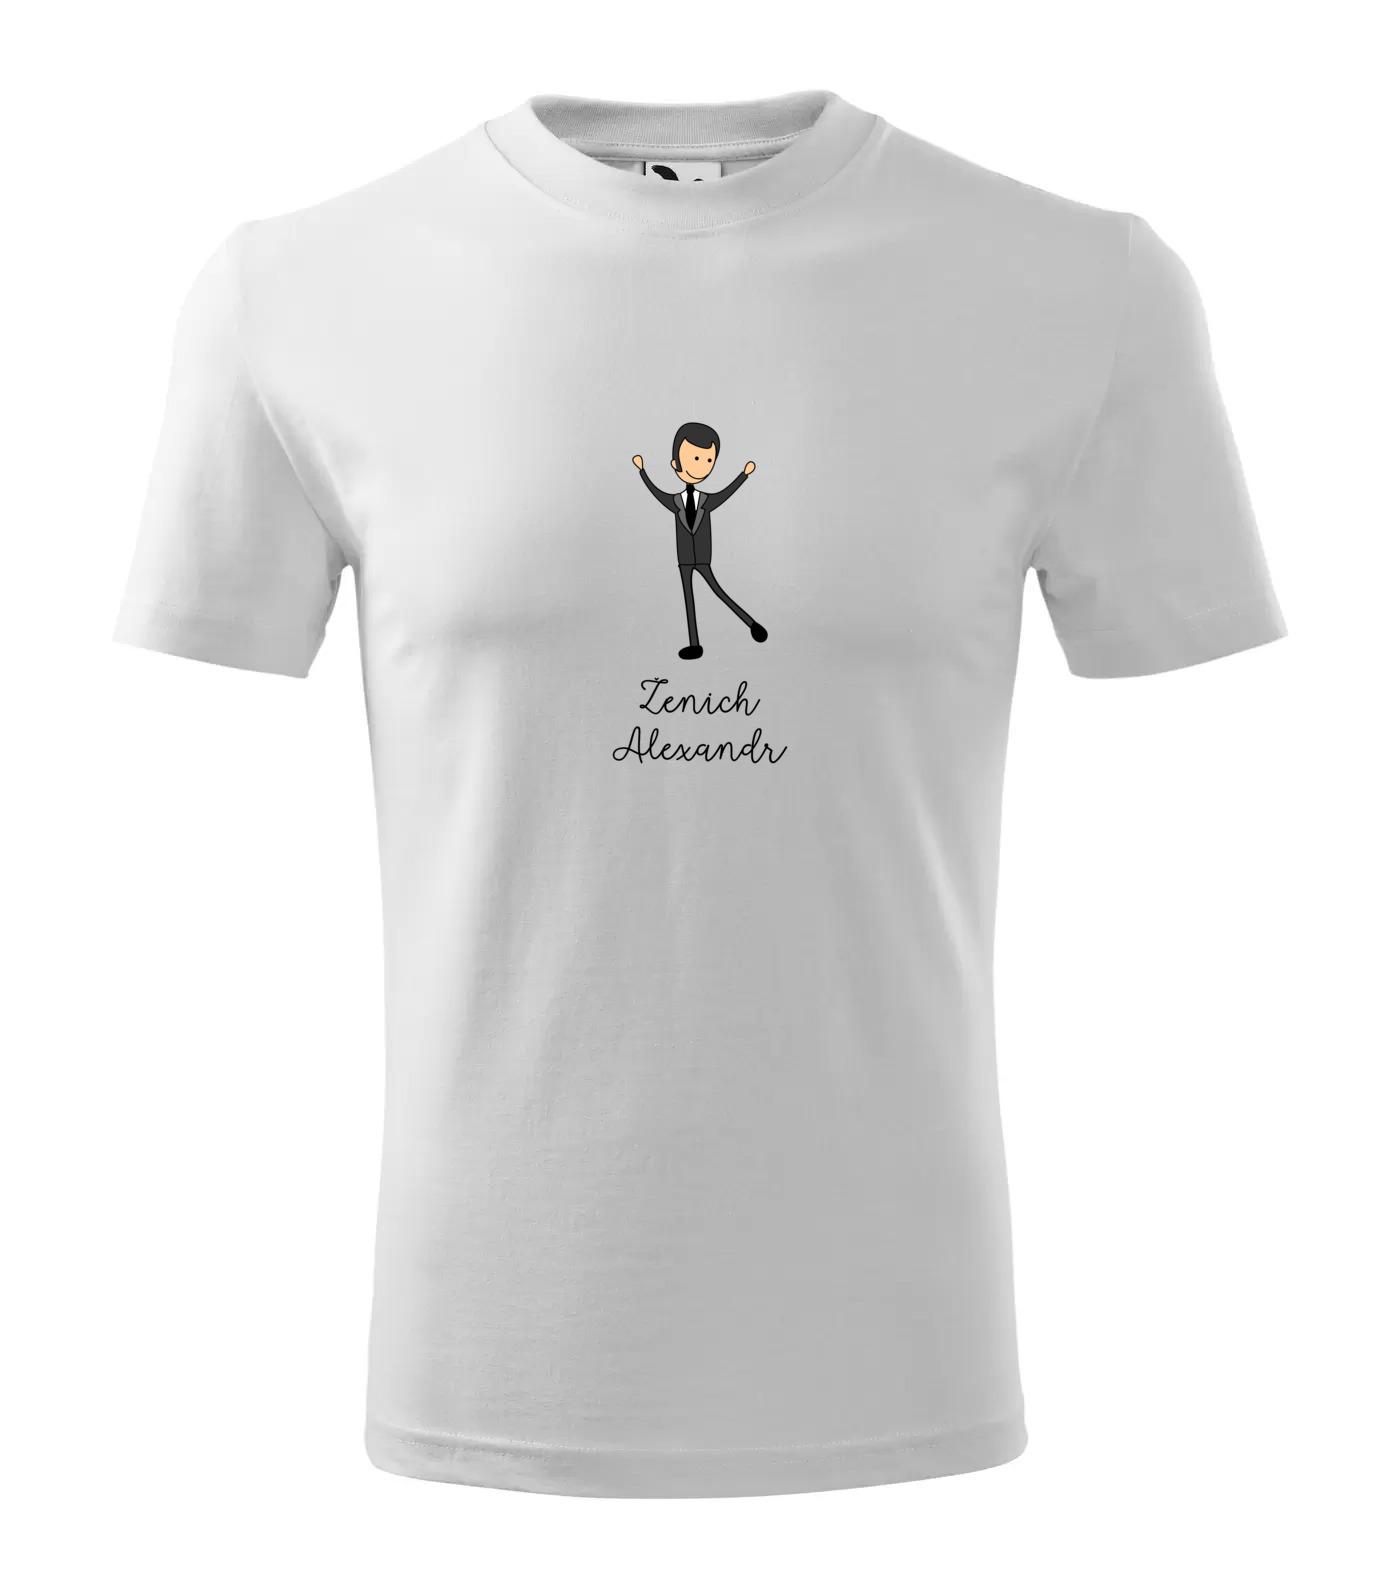 Tričko Ženich Alexandr